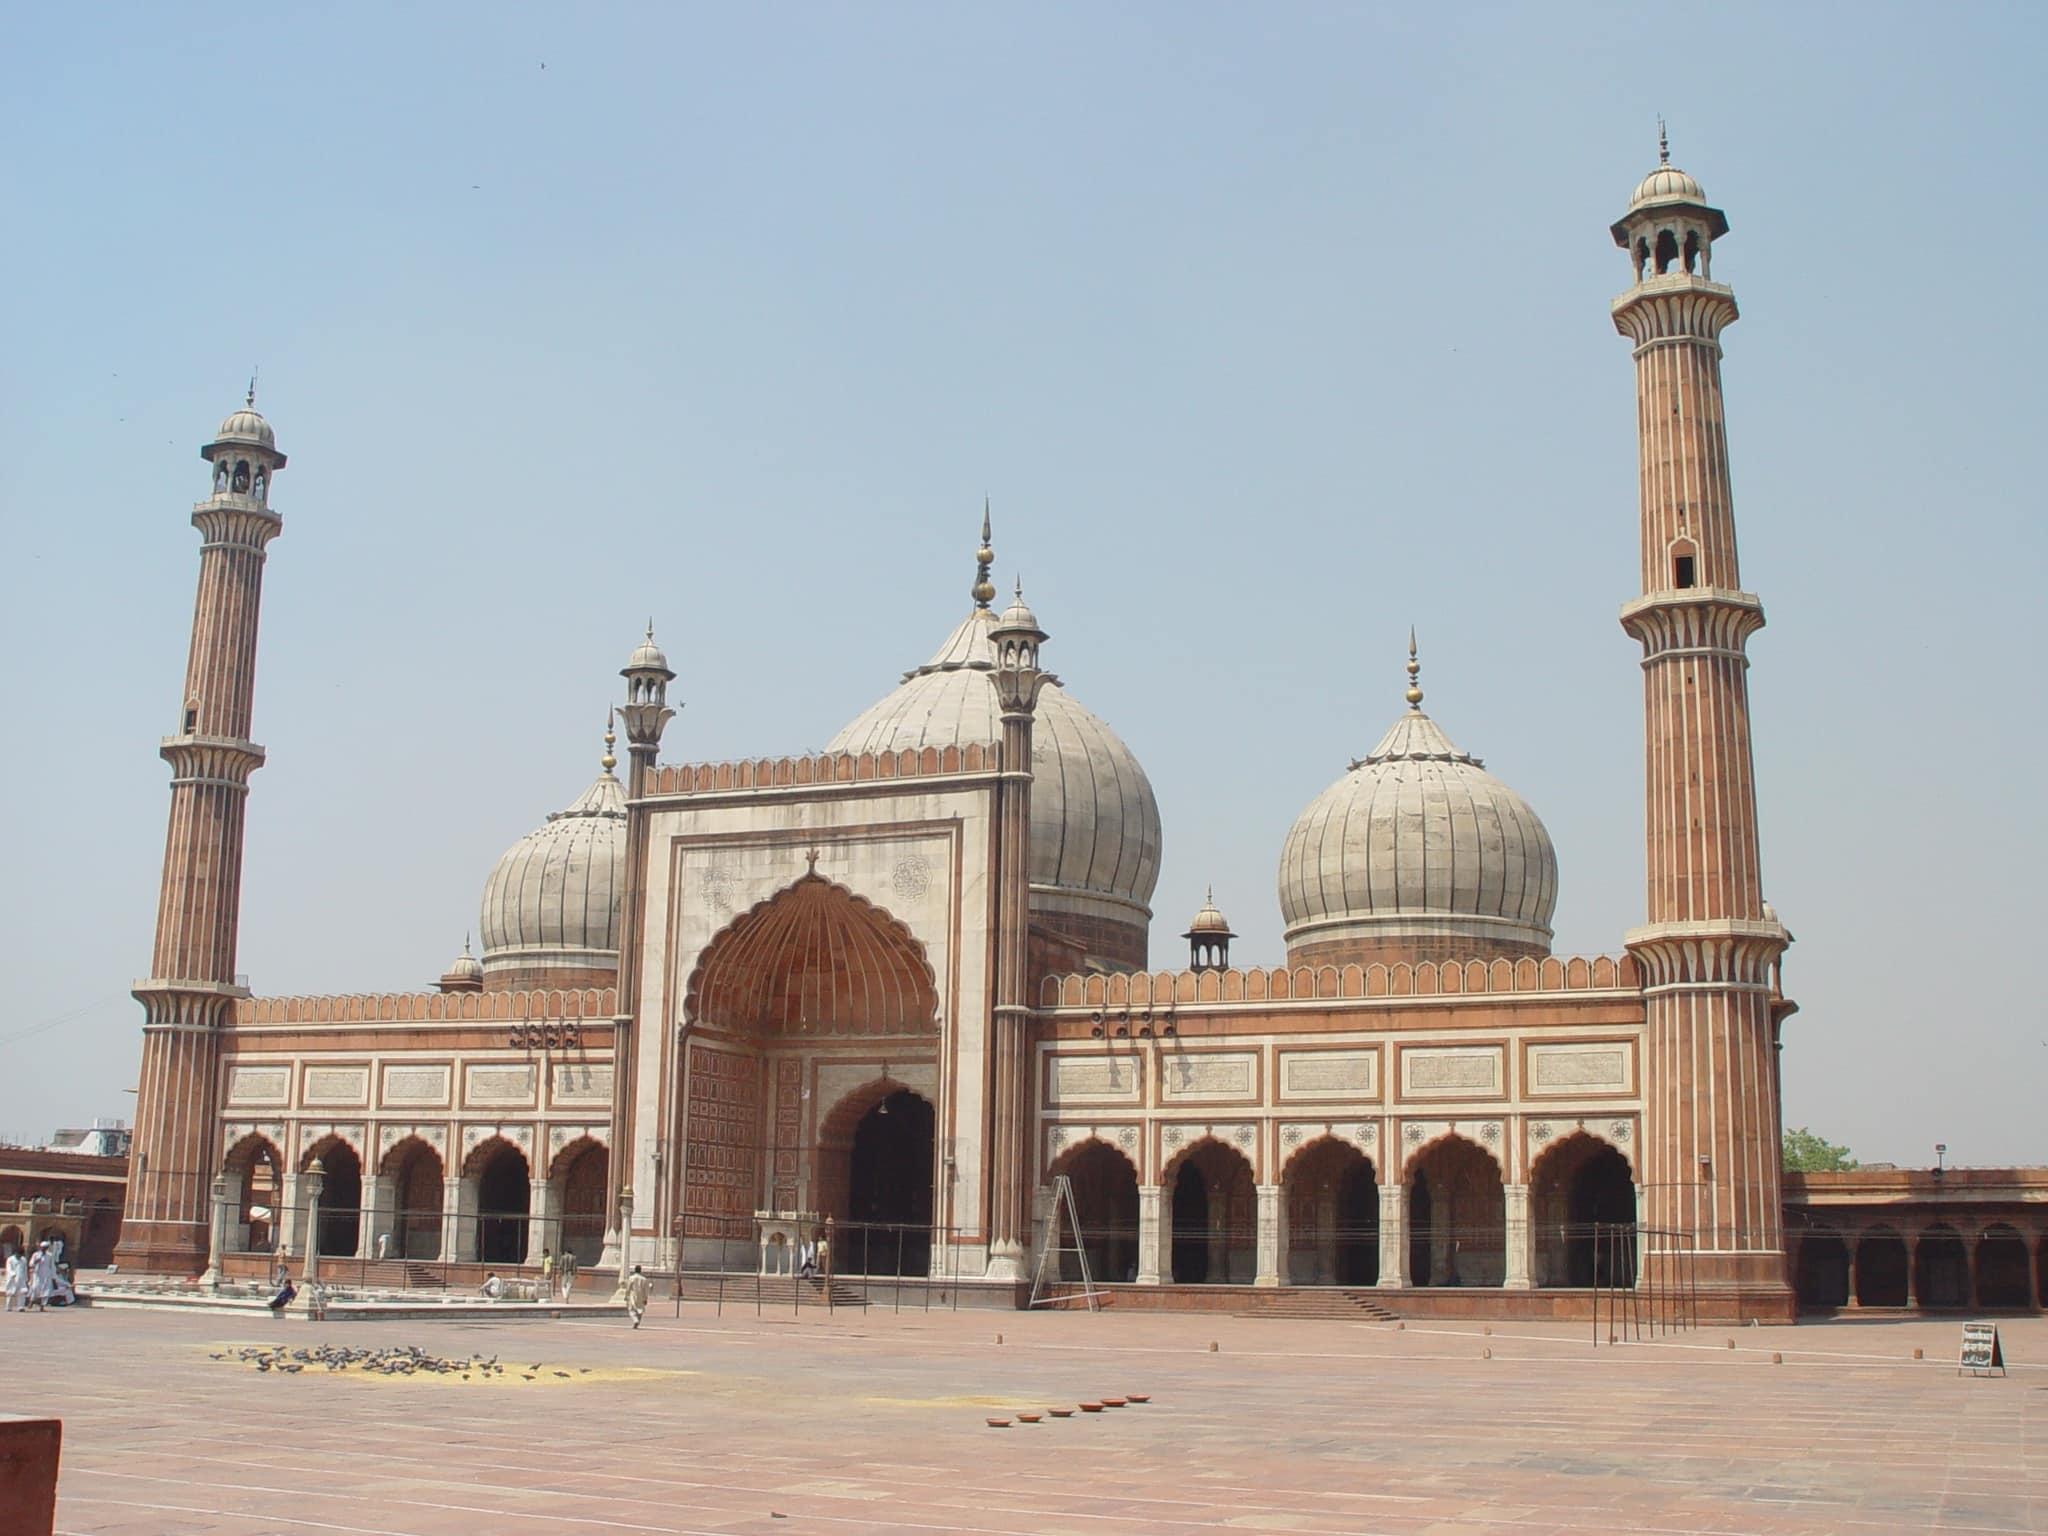 Exotic Himachal Delhi, Shimla, Manali, Dharamshala & Amritsar 5